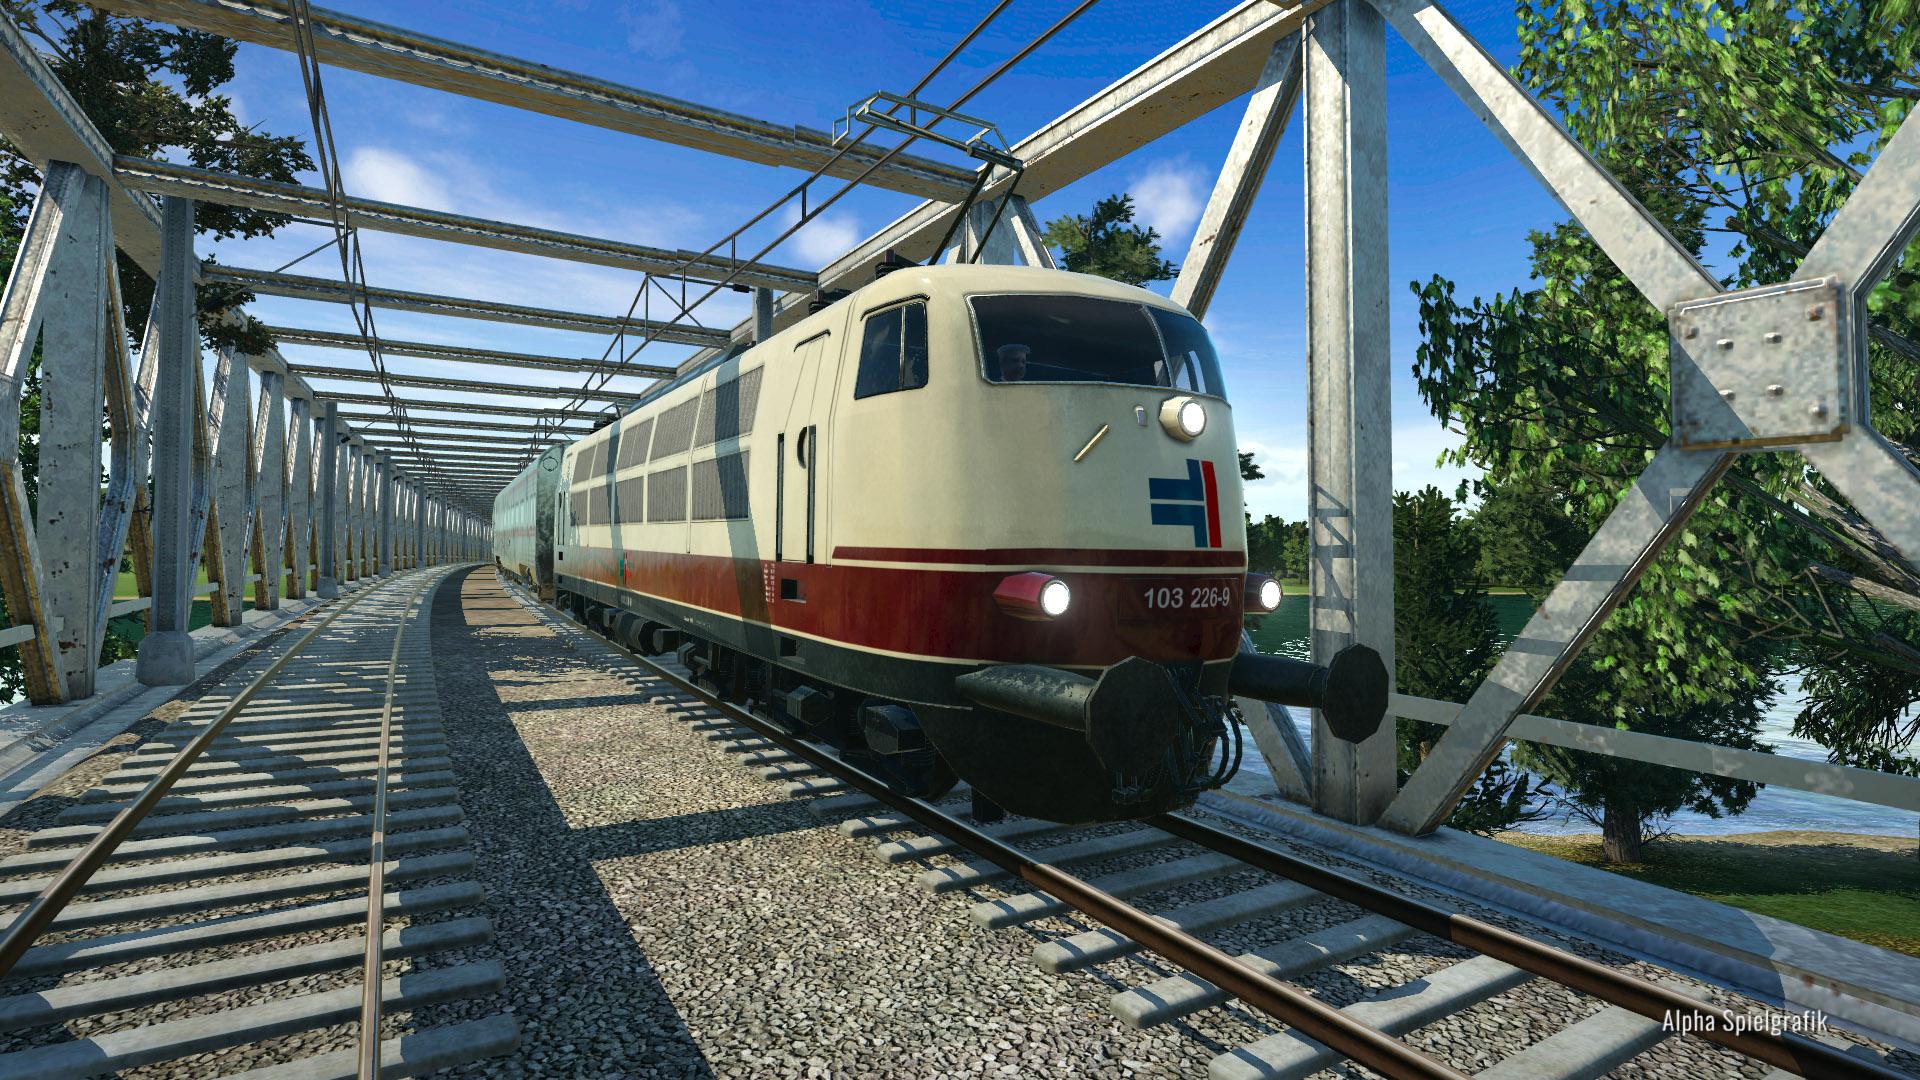 Transport Fever Mac 破解版 铁路主题的模拟经营类游戏-麦氪搜(iMacso.com)